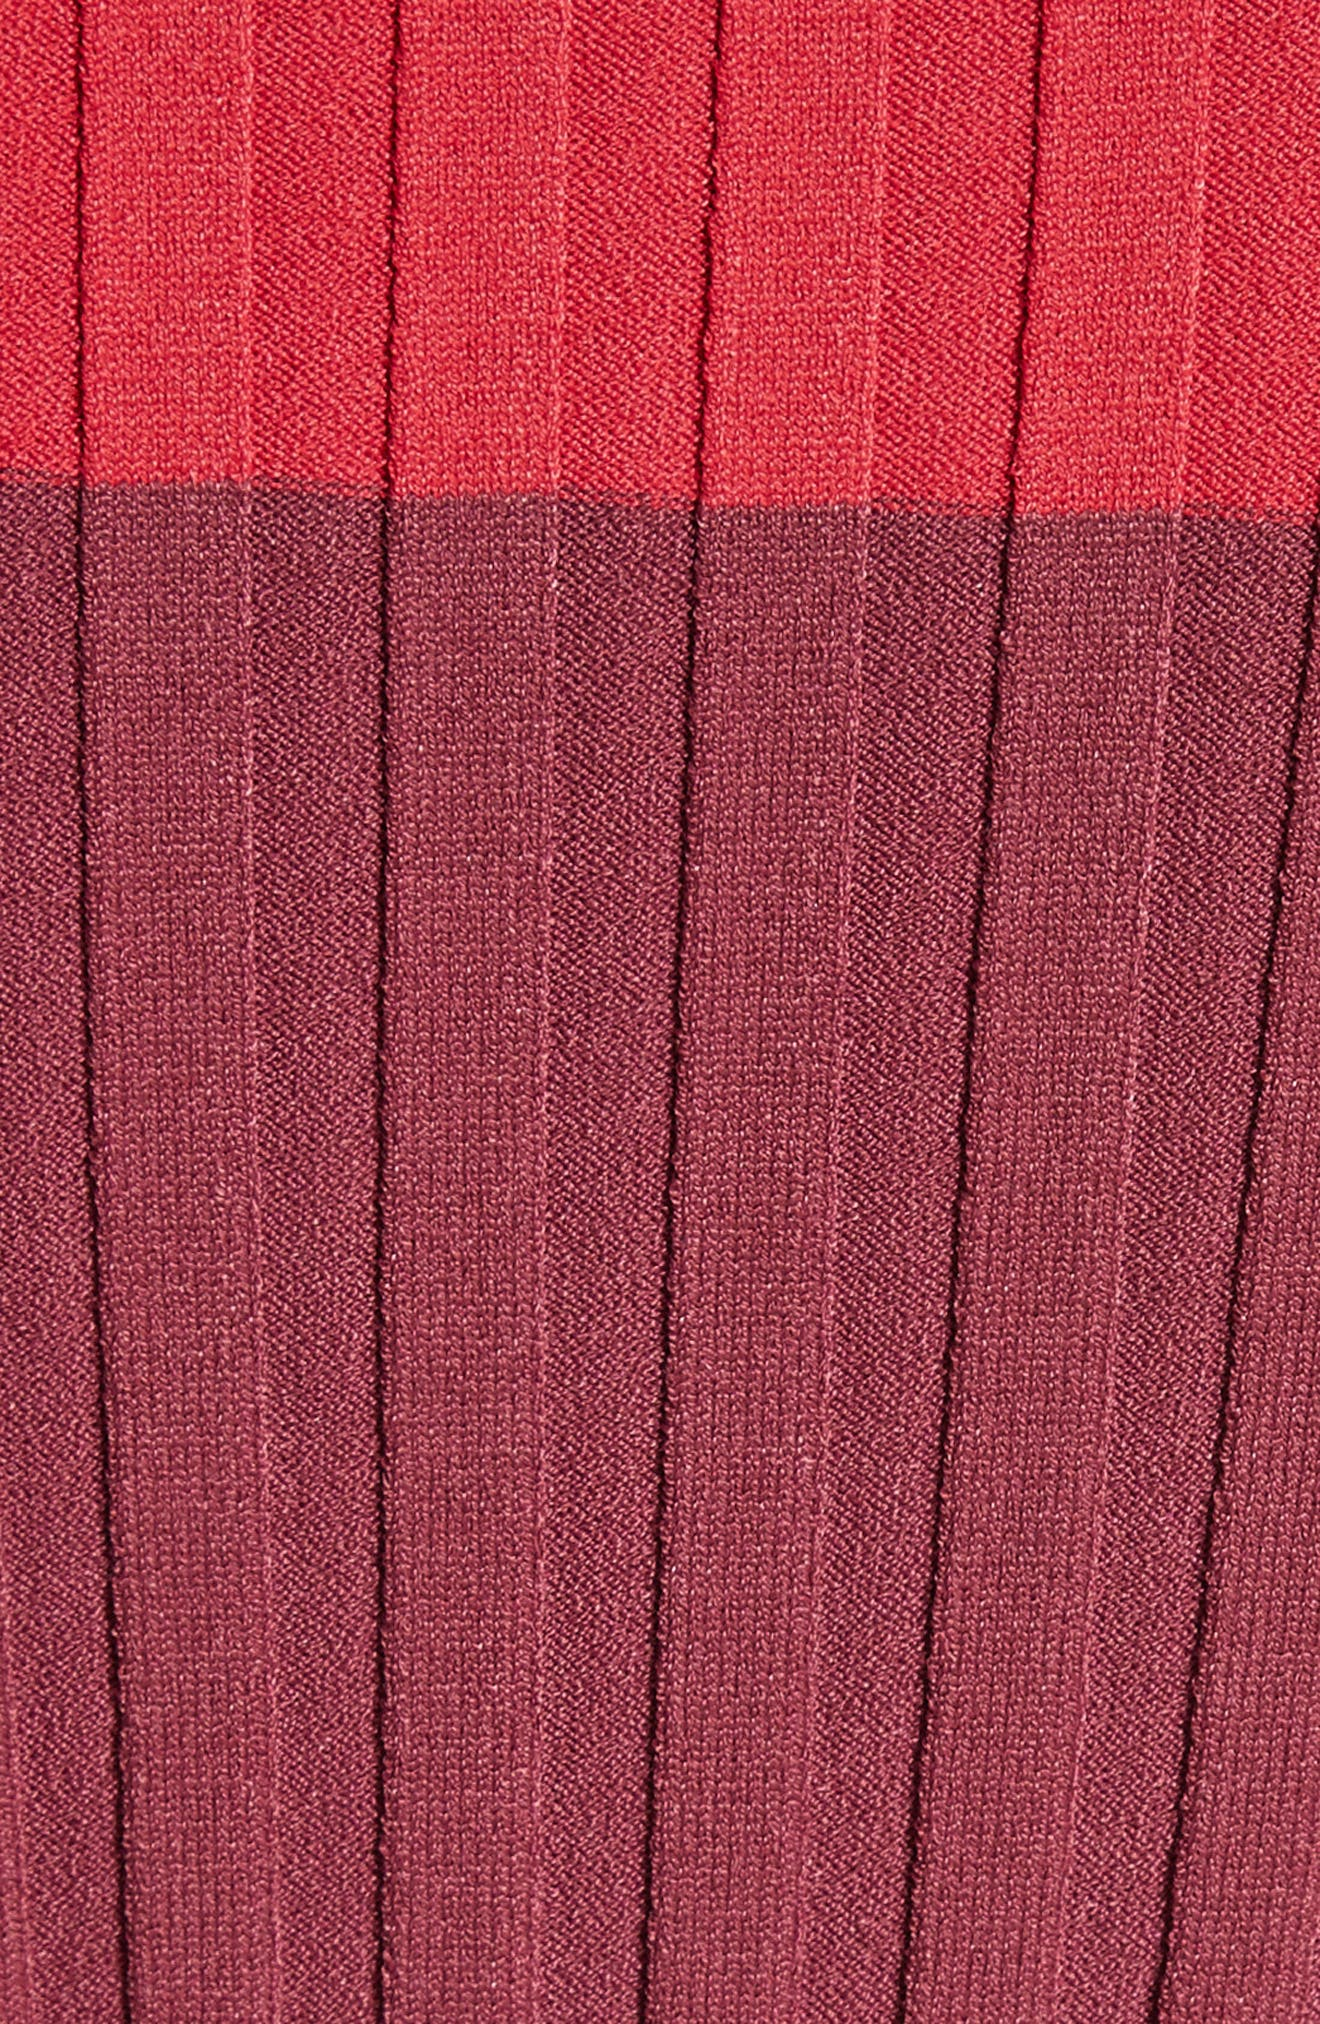 Leila Colorblock Knit Sweater,                             Alternate thumbnail 5, color,                             504